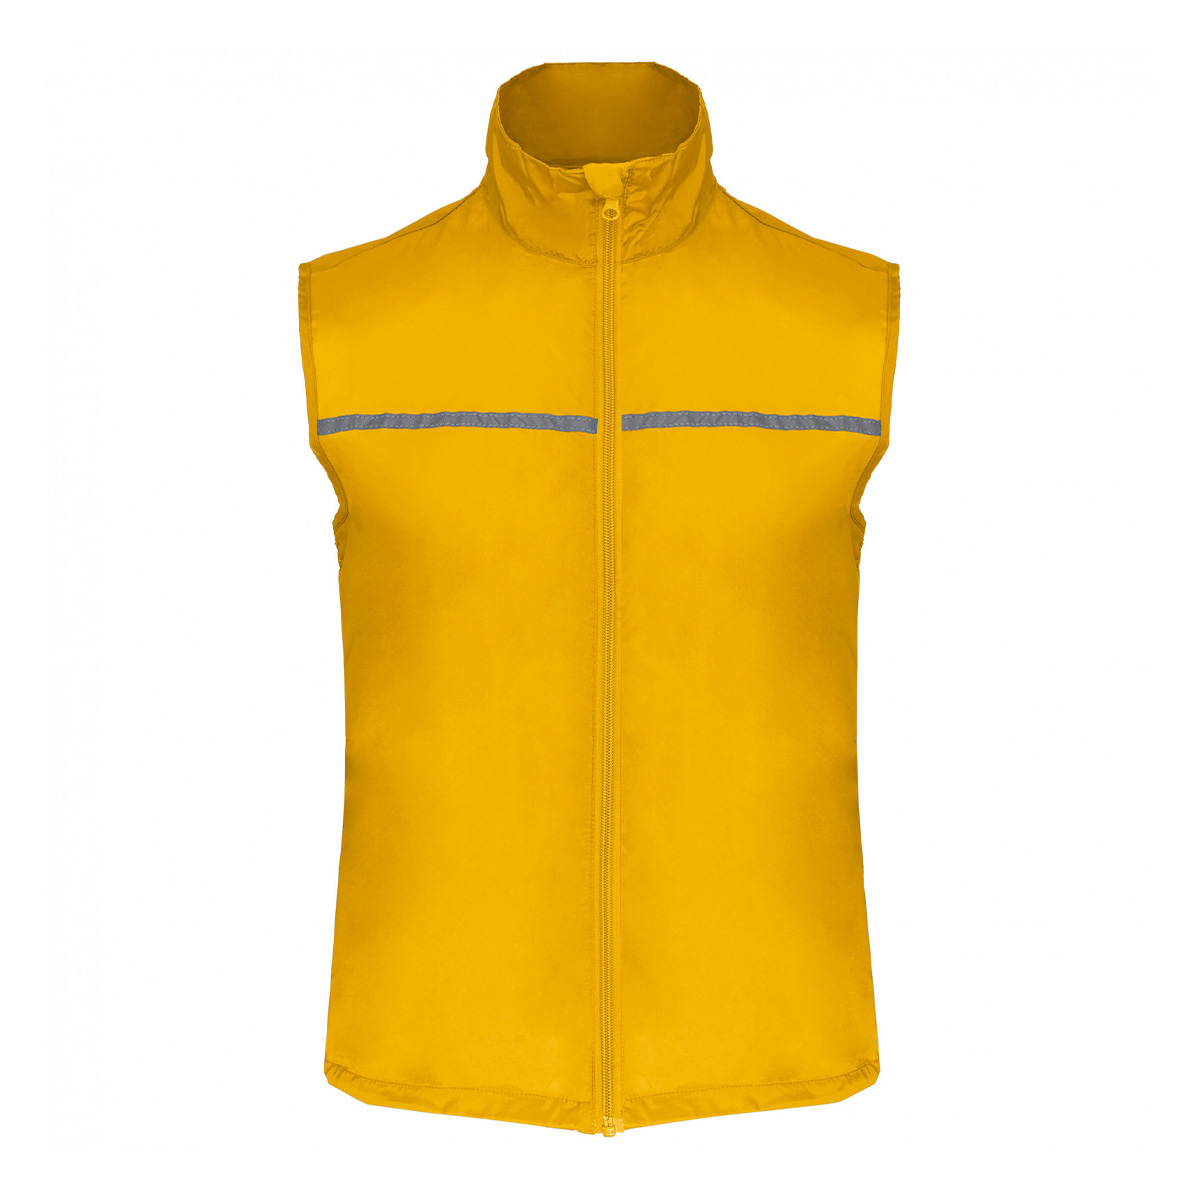 D01_pa234_yellow--0-0--2d7b4839-87d0-4f42-b849-65ffa9ab67e8